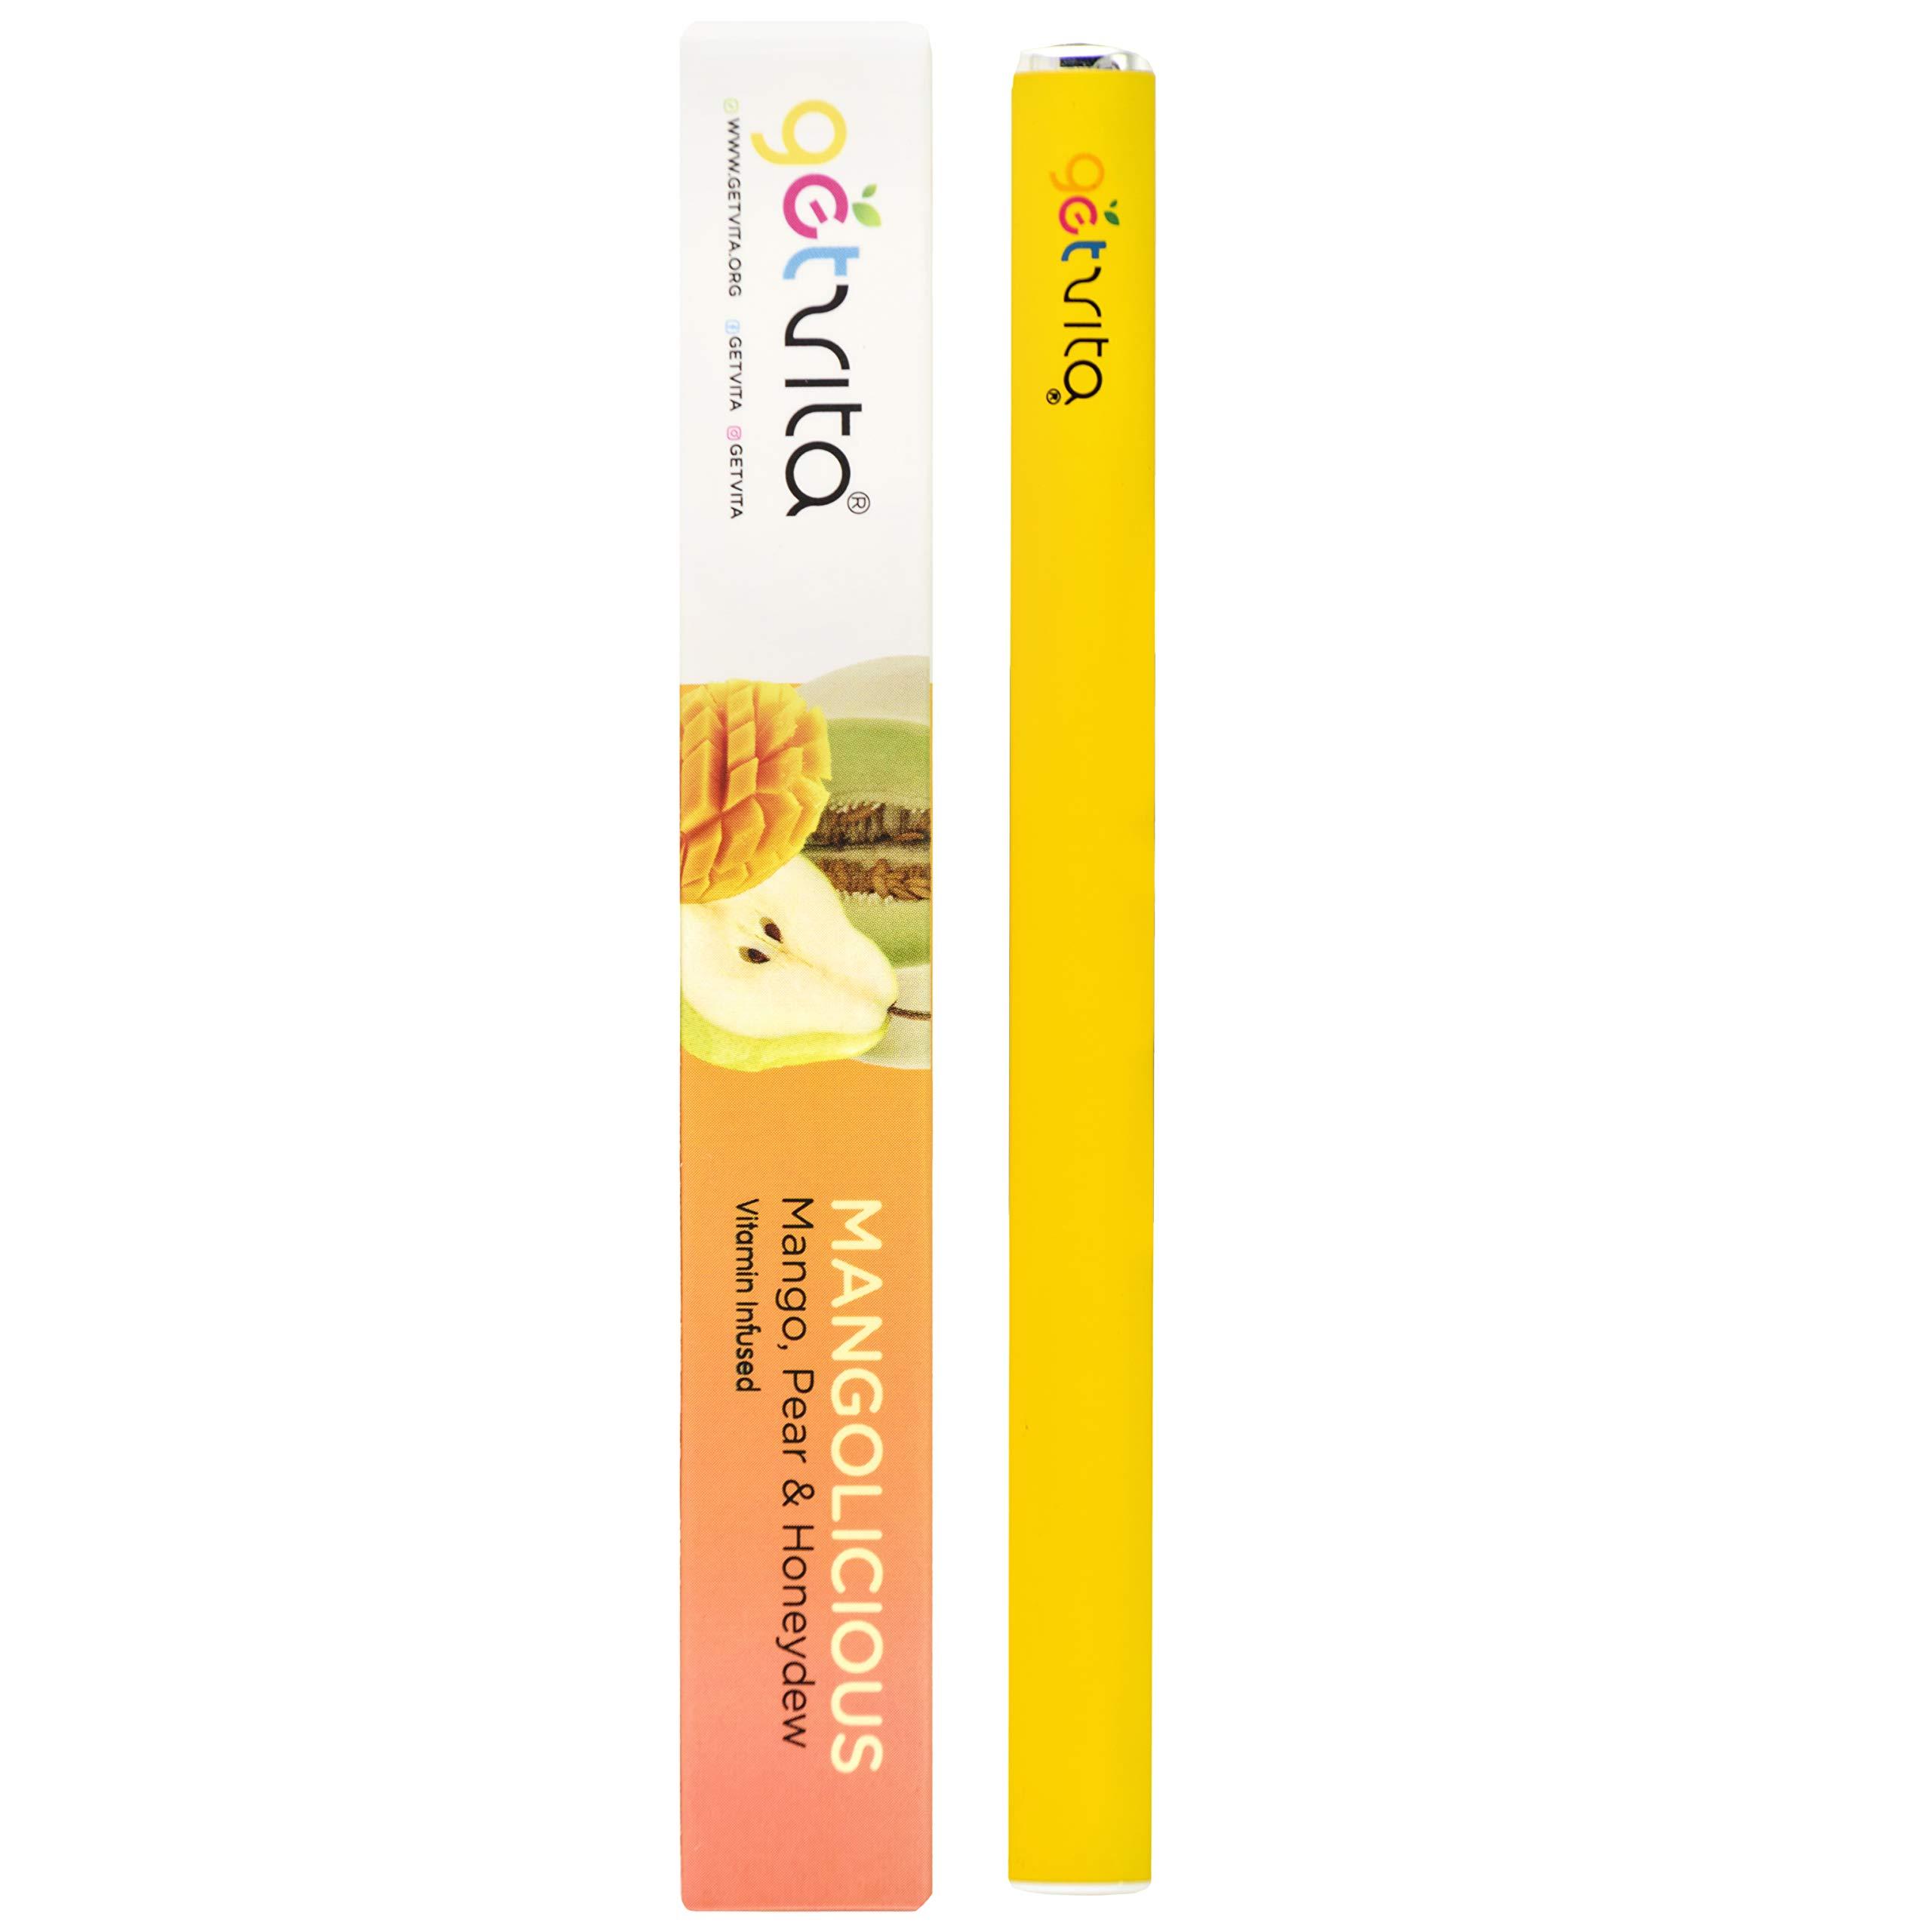 GetVita® (Mangolicious) - America's Organic MultiVitamin Diffuser Inhaler Vaporizer w/Vitamins A C D E B1 B2 B3 B5 B6 B7 B8 B12 B15 - Over 200+ Inhalations - Mango w/Pear & Honeydew Flavor